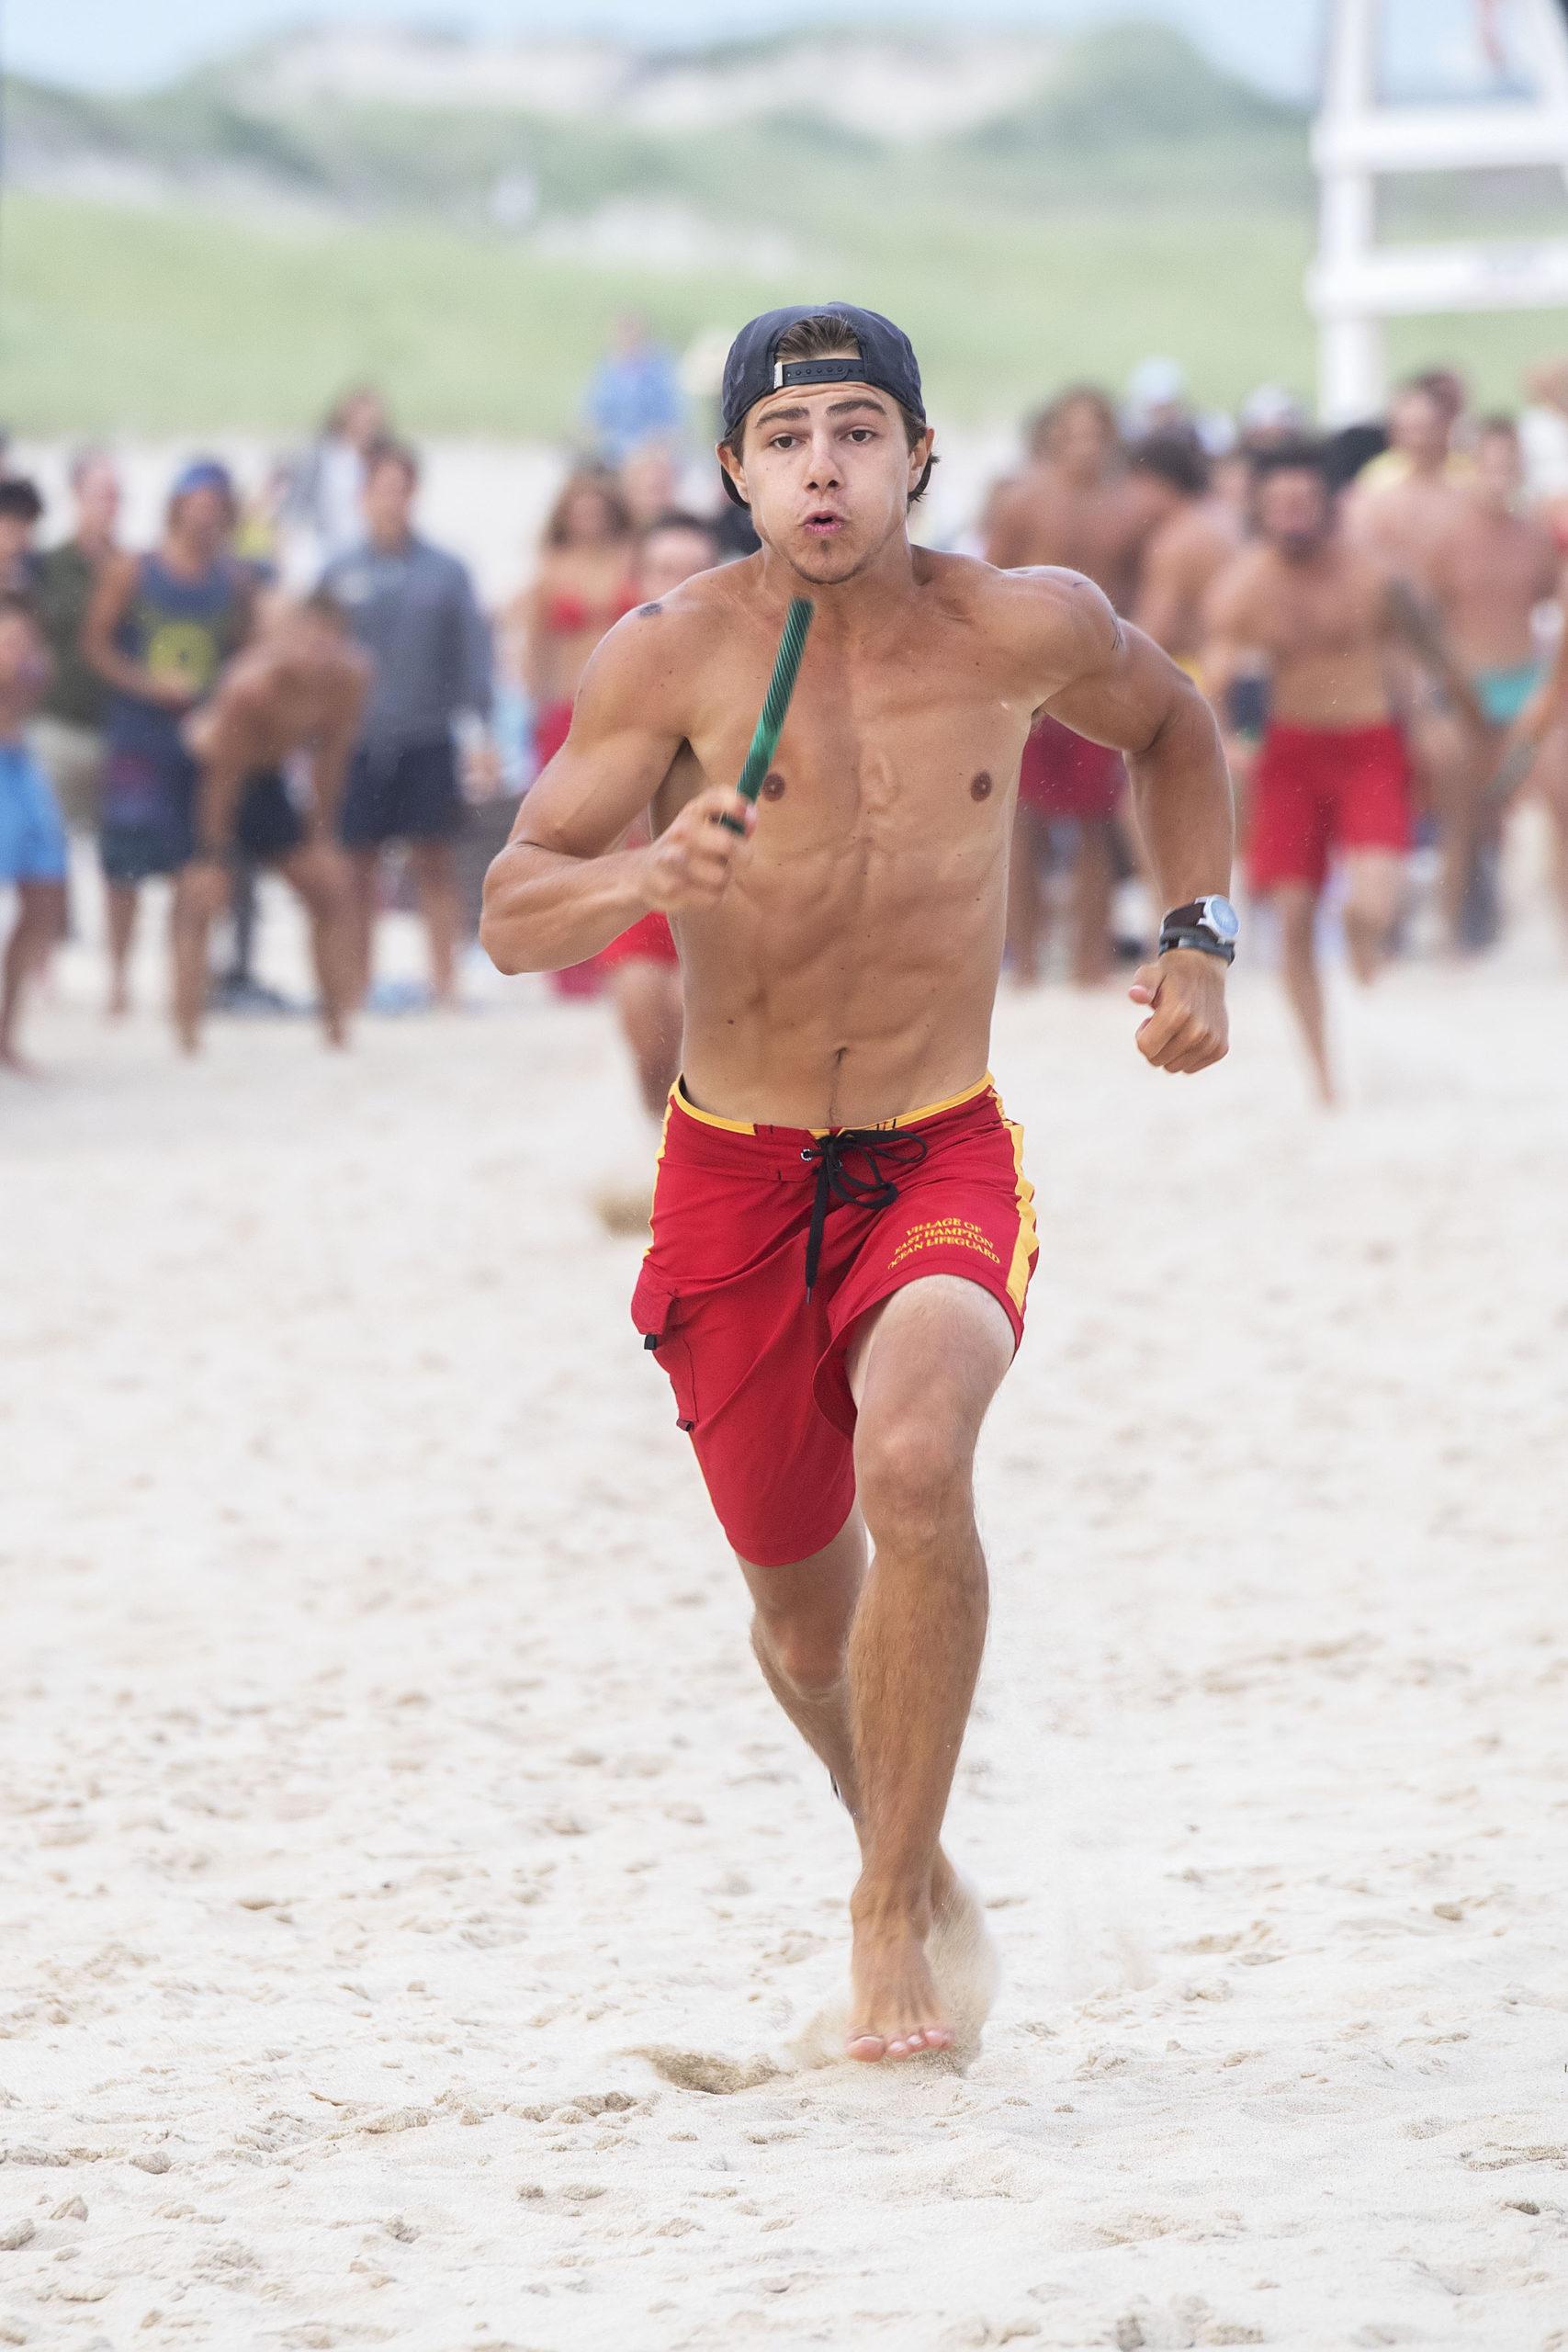 East Hampton Village lifeguard William Schlegel runs in the men's sprint relay.